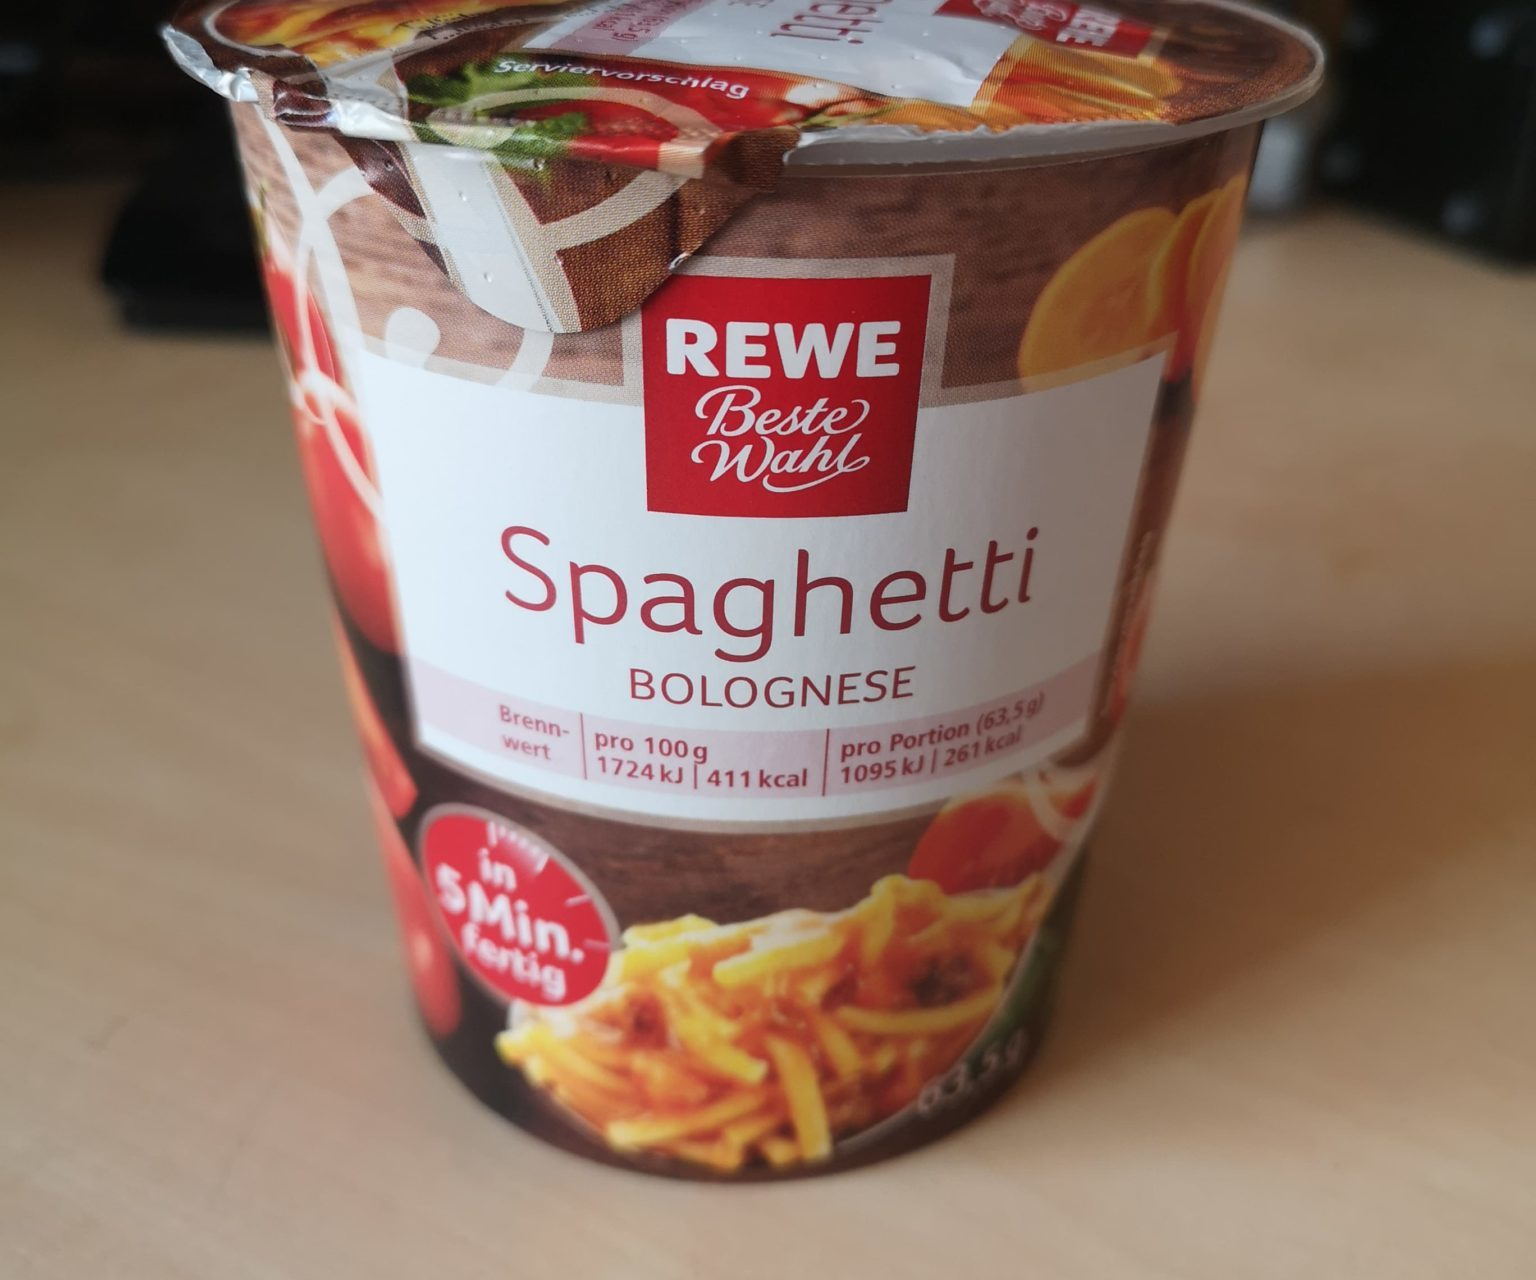 "#1662: REWE Beste Wahl ""Spaghetti Bolognese"""